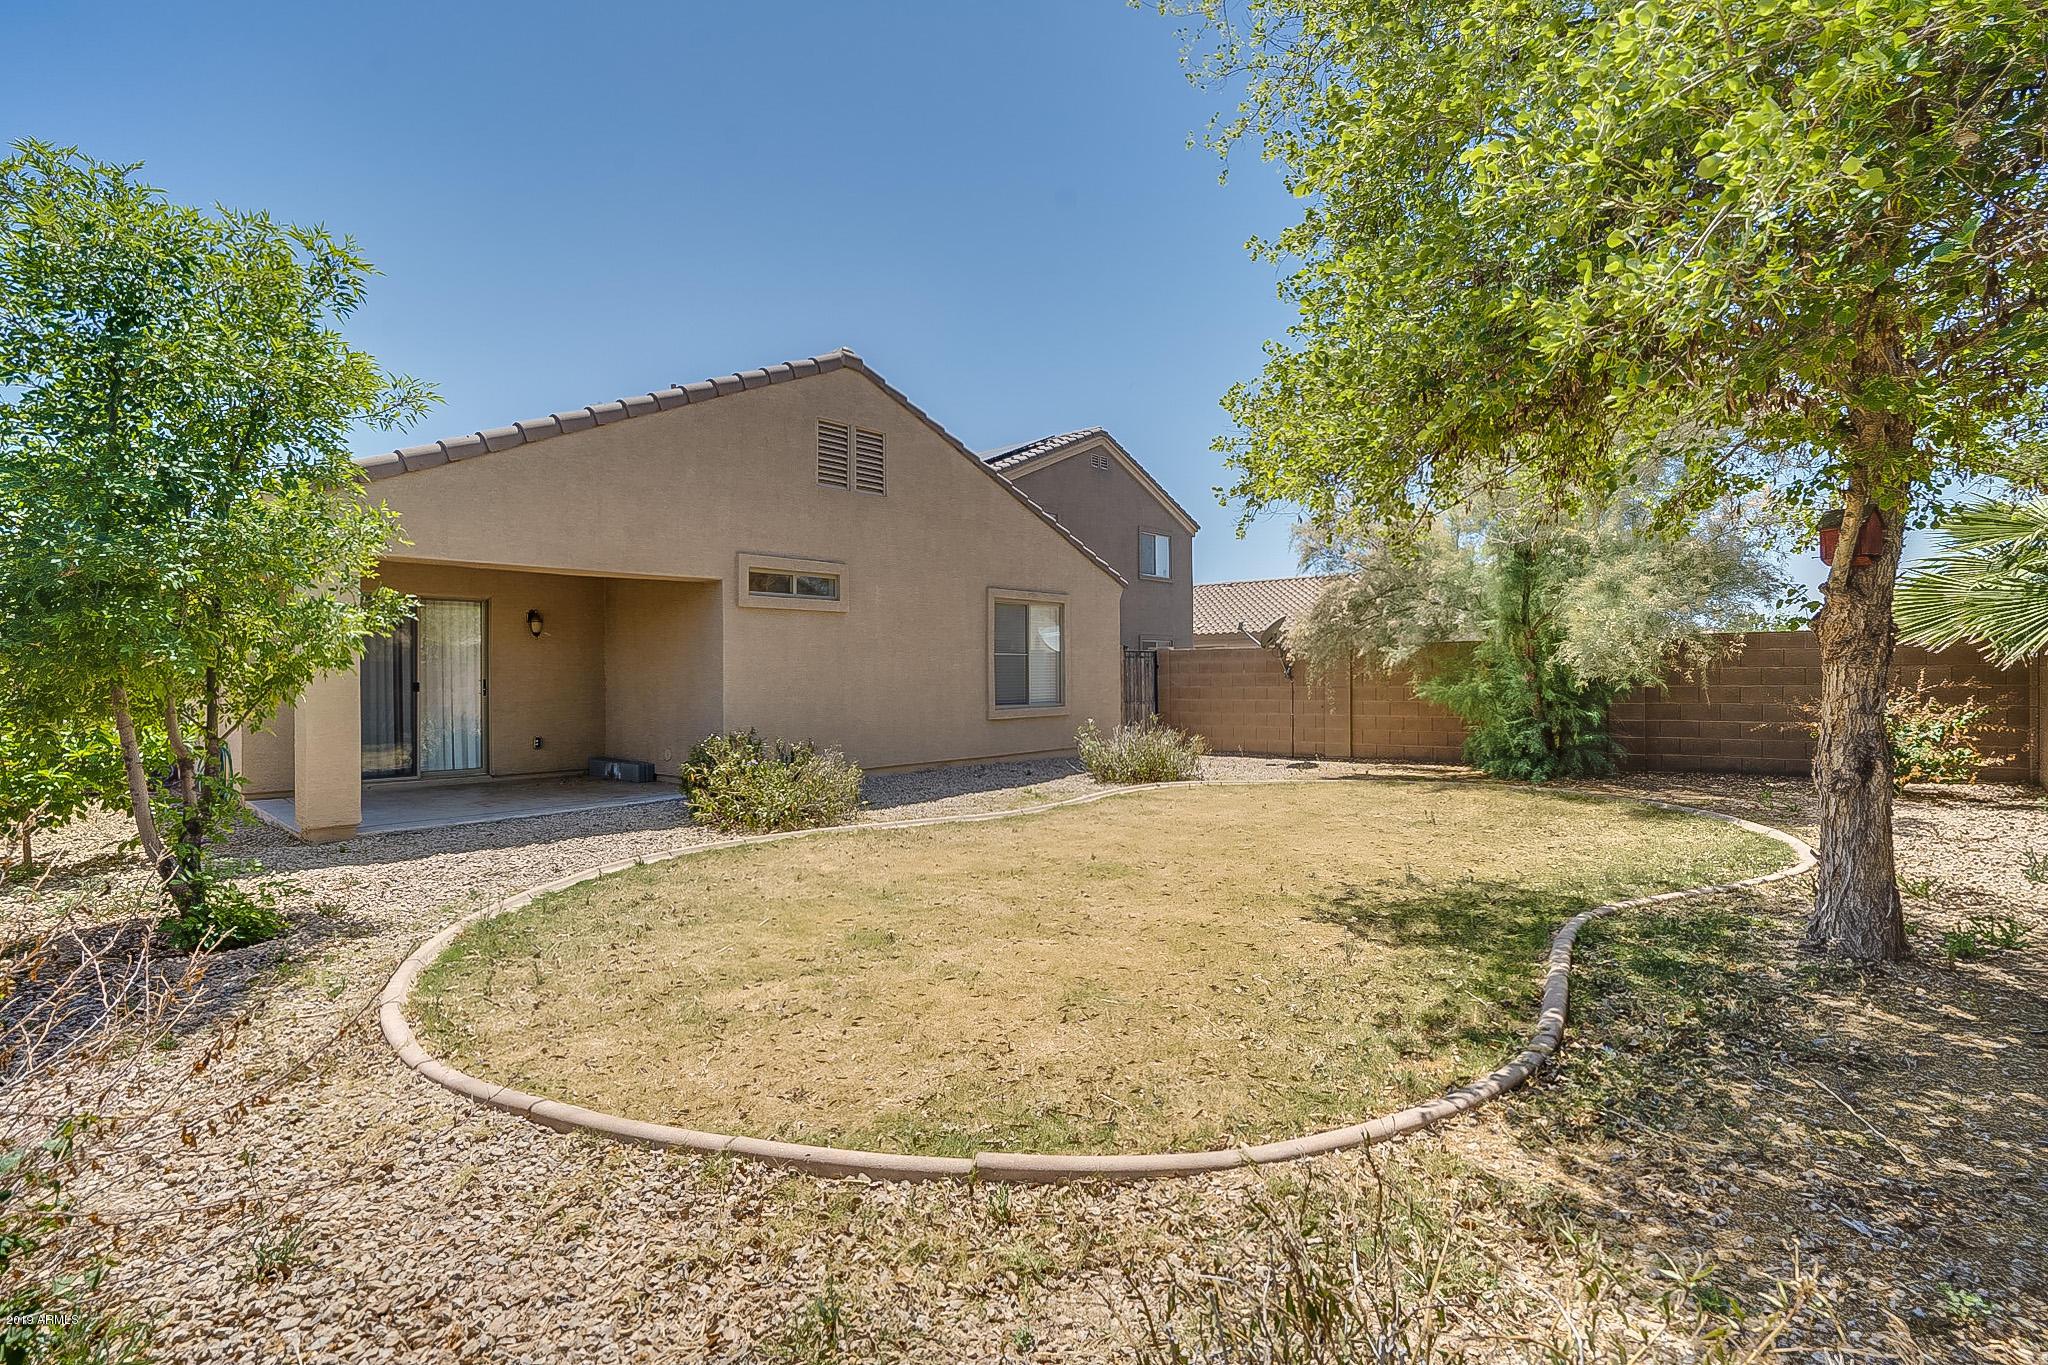 MLS 5921167 2210 W BROADWAY Avenue, Coolidge, AZ 85128 Coolidge AZ Three Bedroom